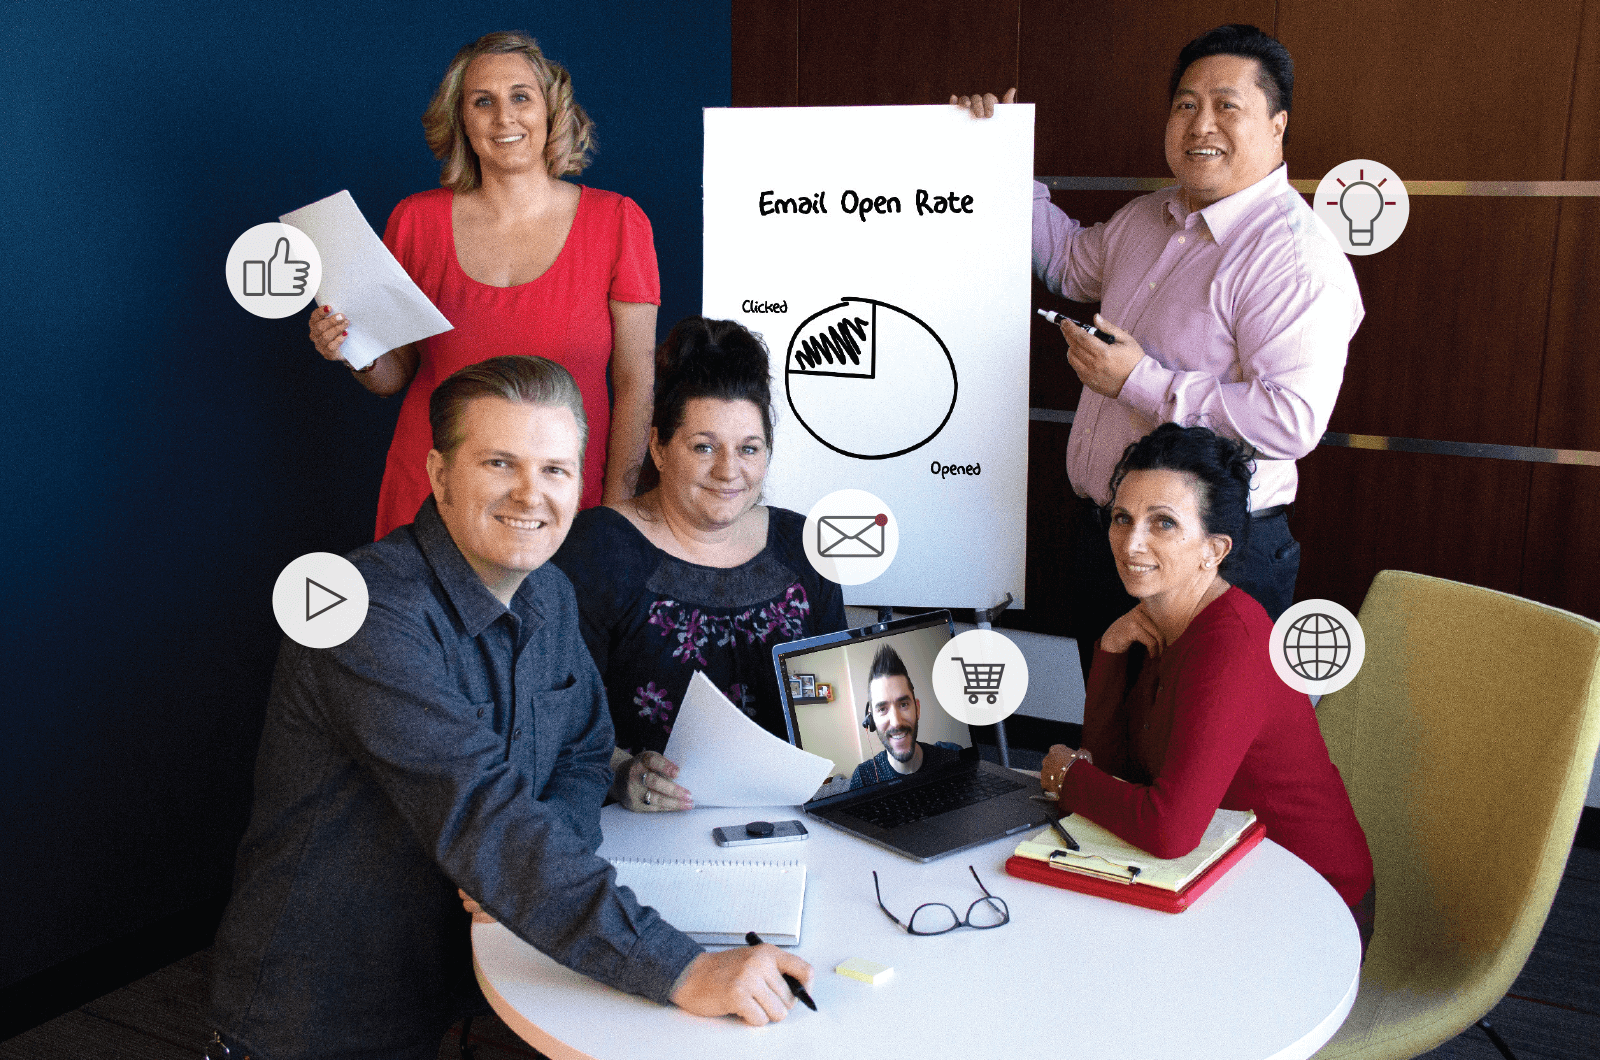 Members of the World Headquarters digital marketing team